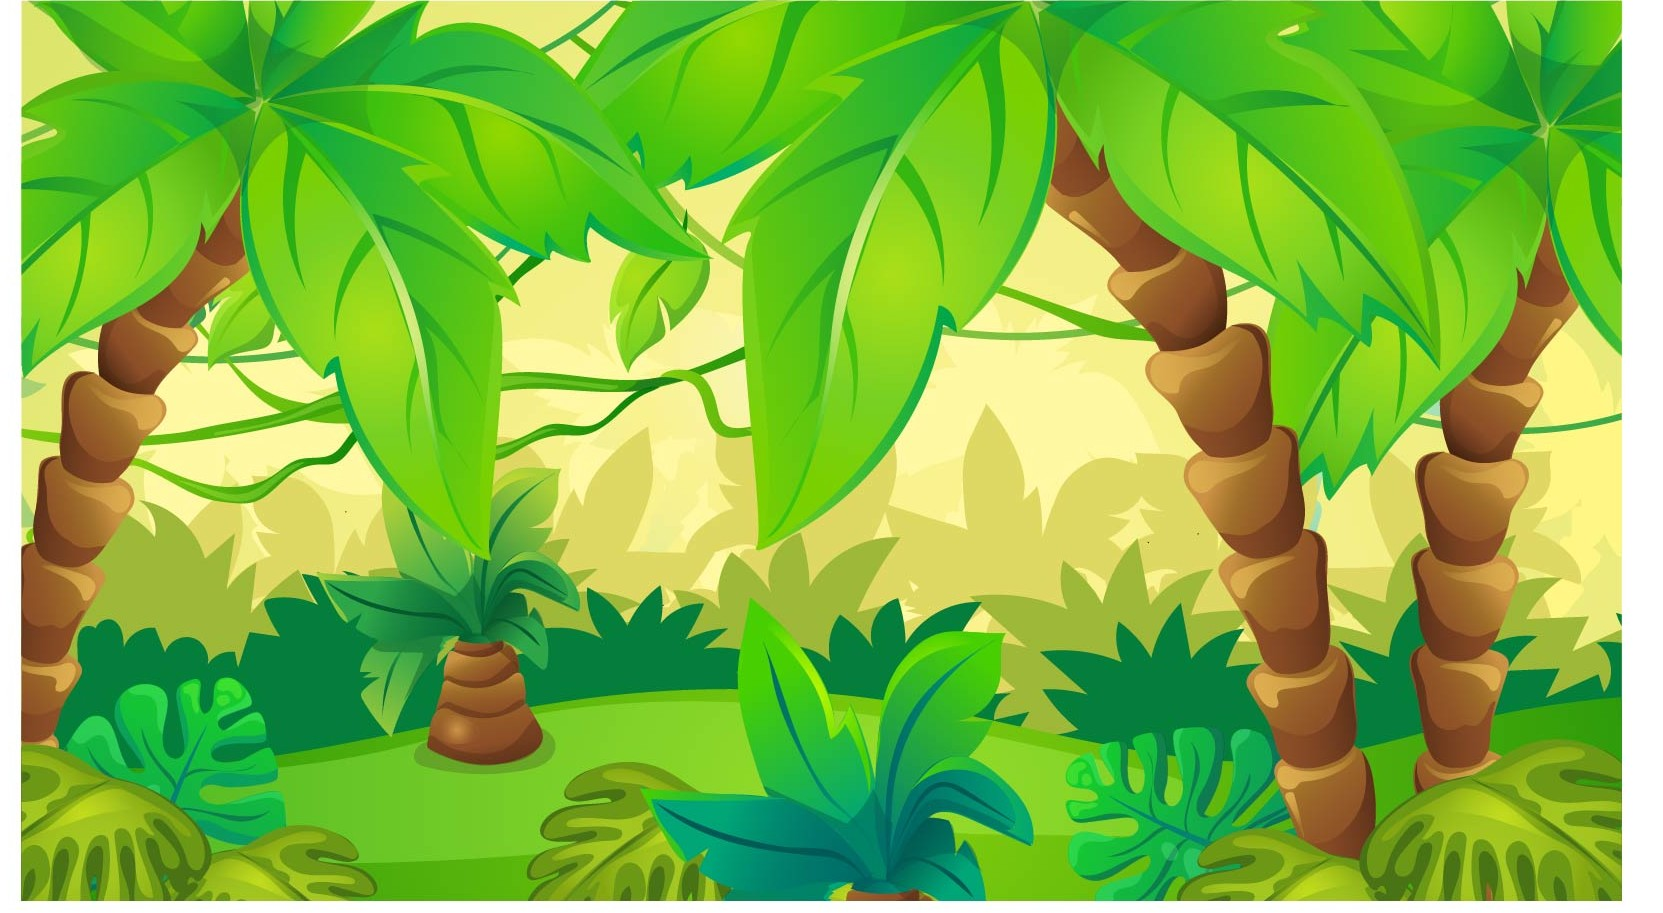 Monkeys And Bananas Cute Wallpaper Cartoon Green Cute Forest Rainforest Jungle Theme Backdrop